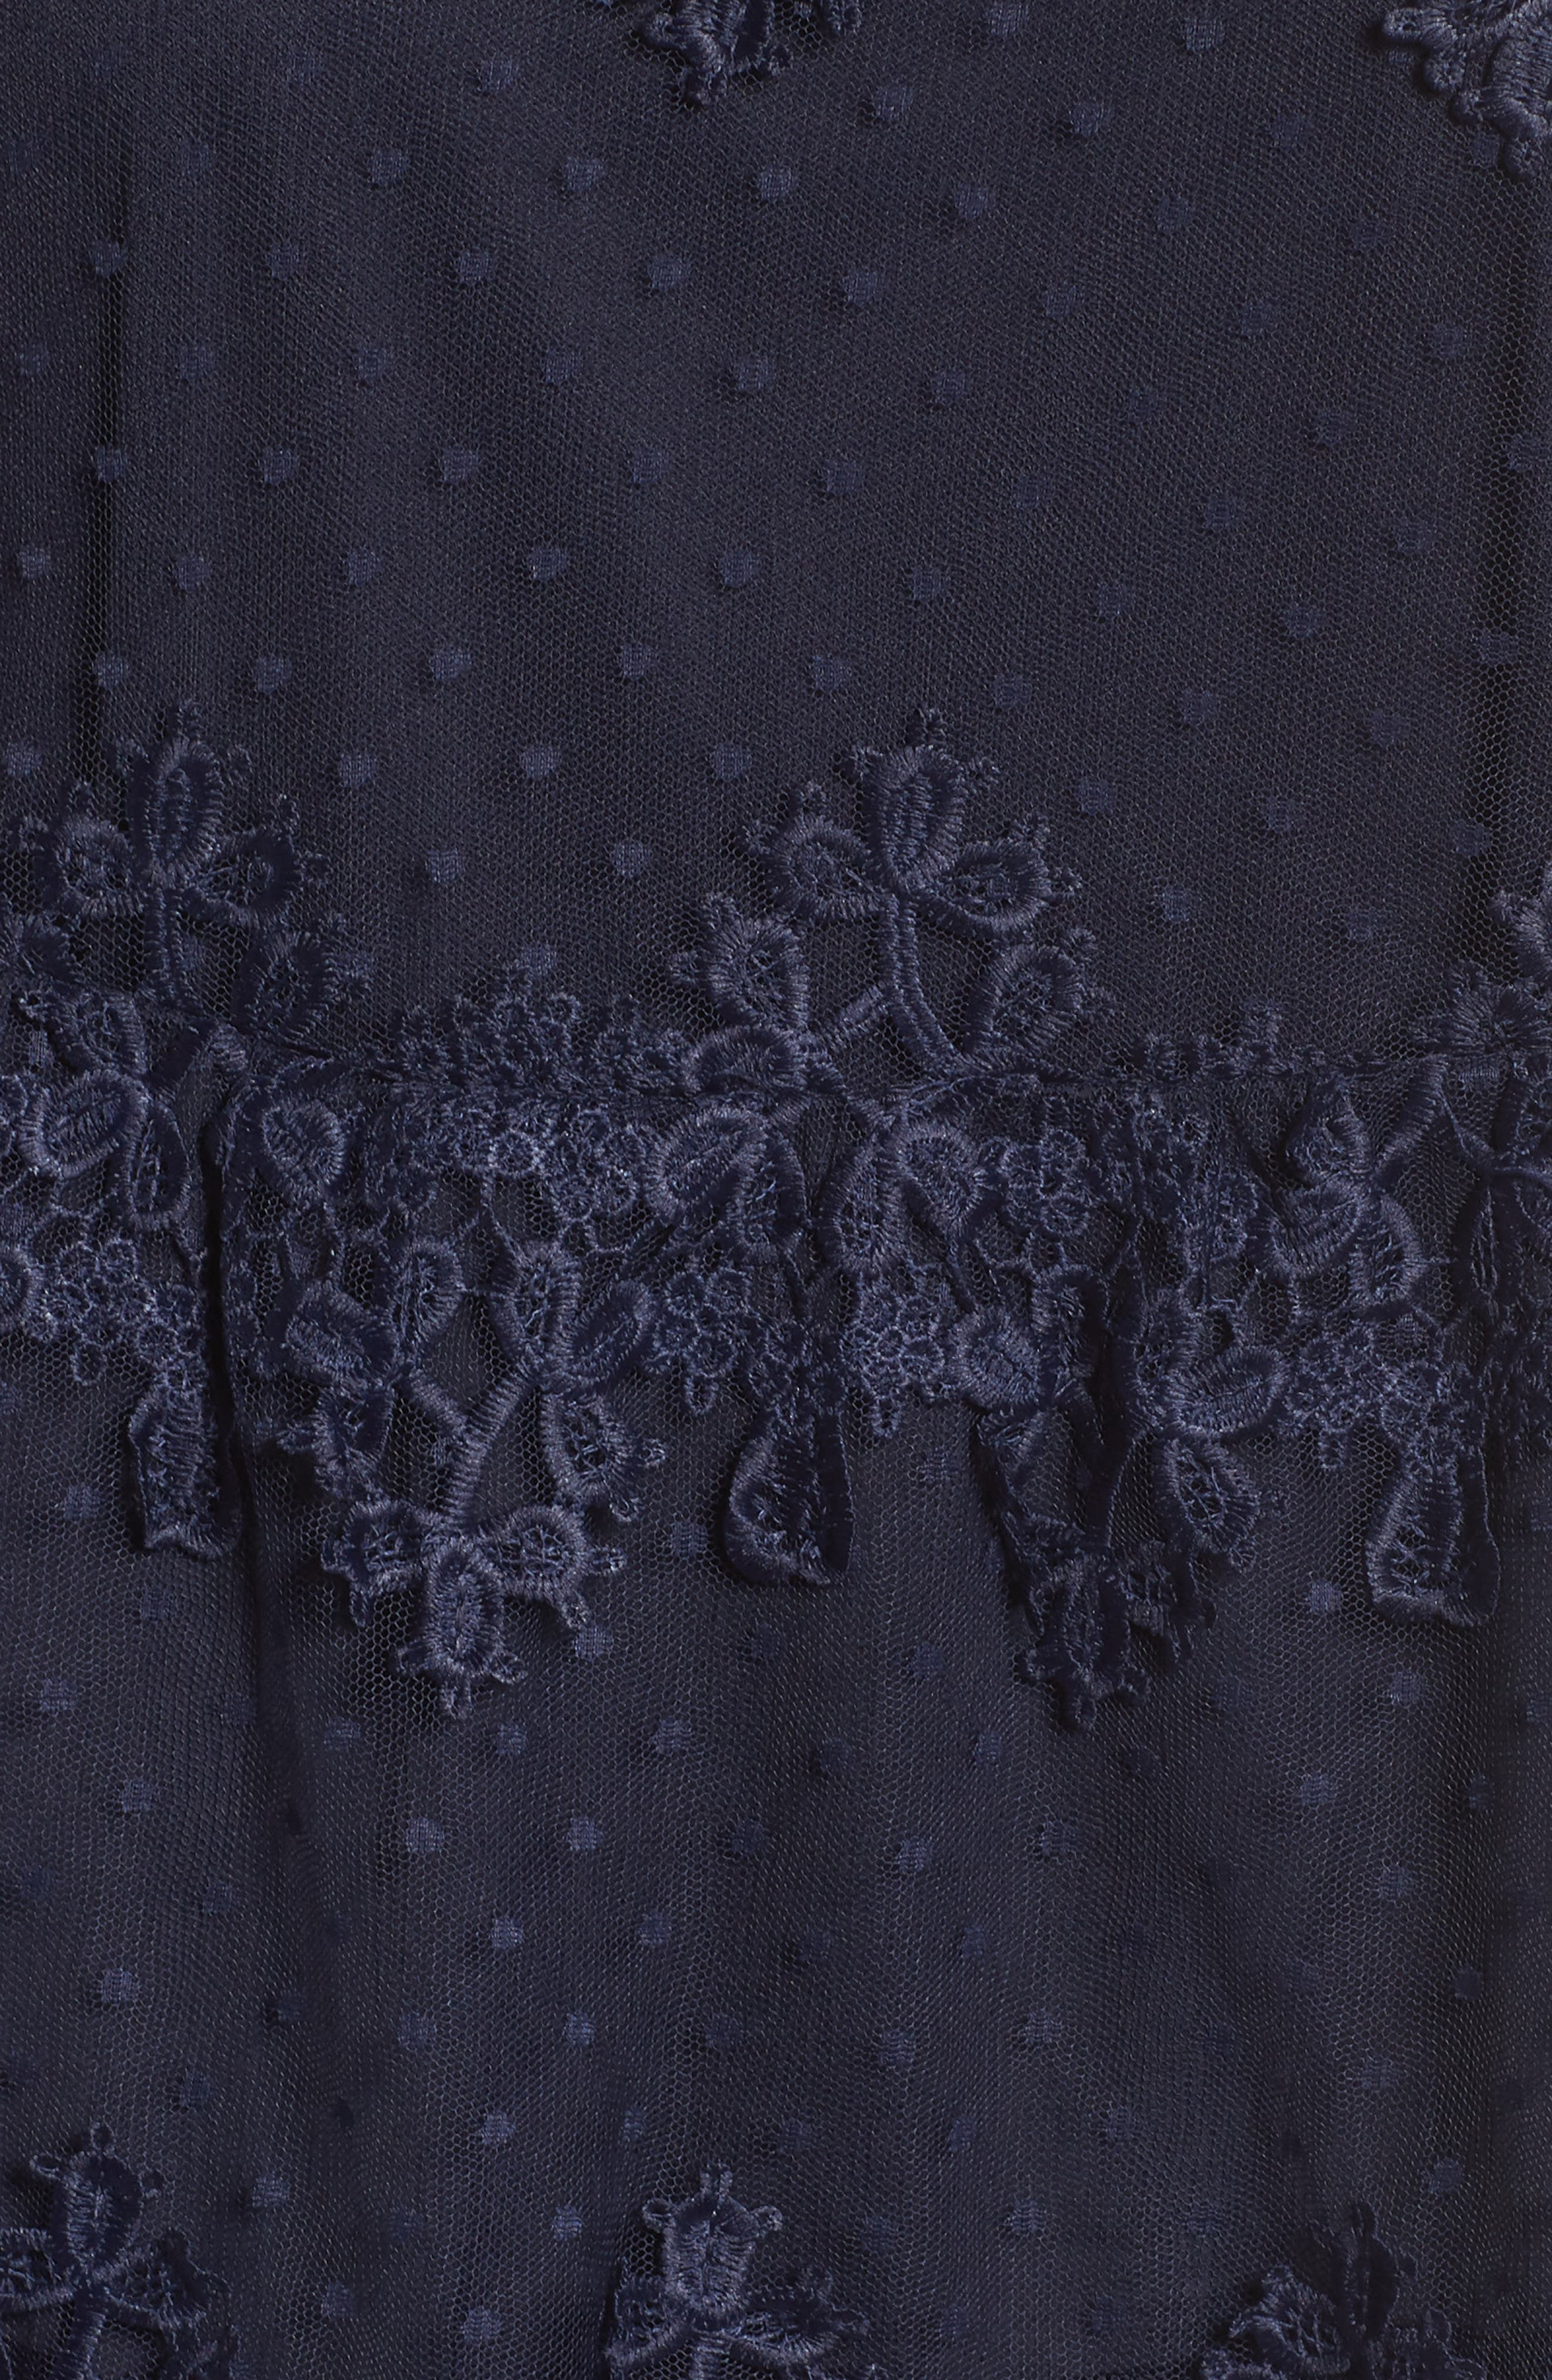 Lace Swiss Dot Swing Dress,                             Alternate thumbnail 6, color,                             410